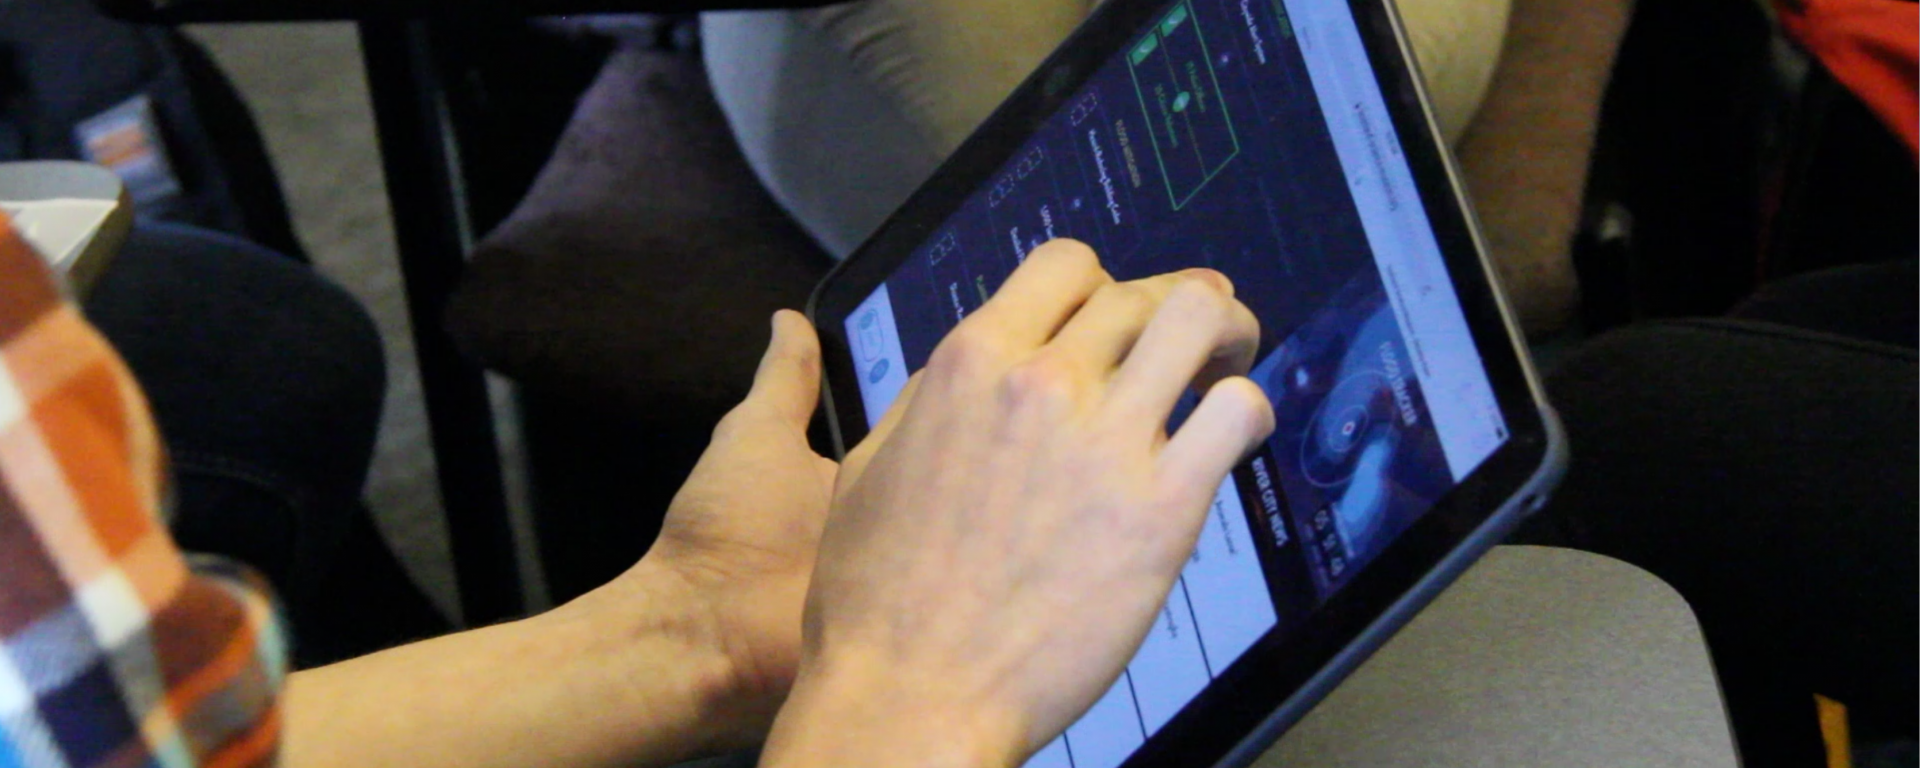 Student using iPad in class